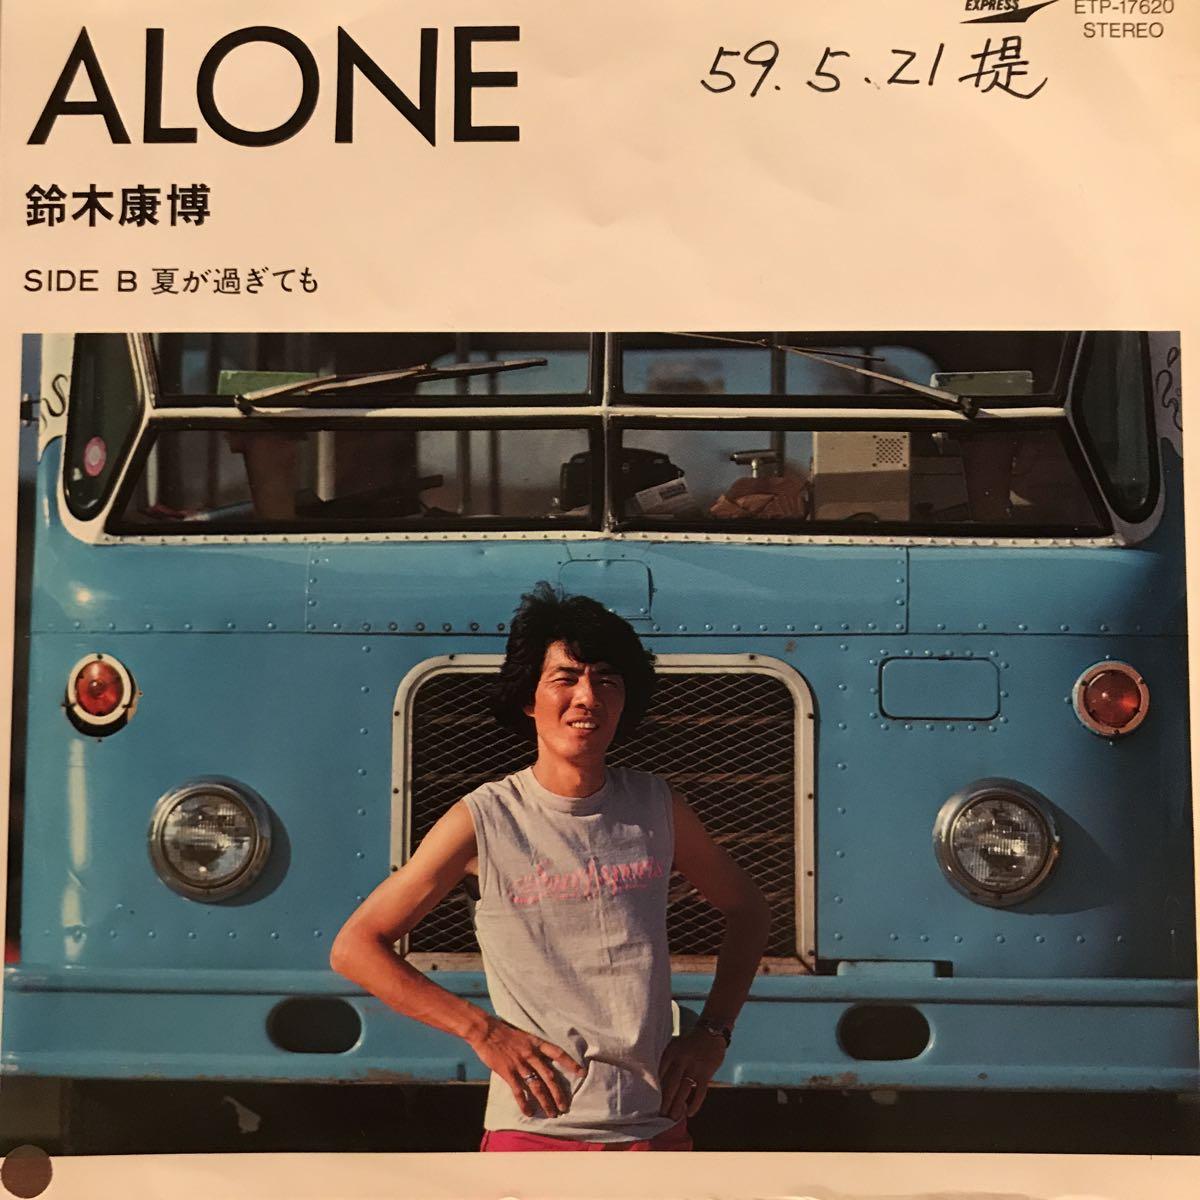 * EP【良品】非売品 見本盤 希少 和モノ 45s【 鈴木康博 】ALONE / 夏が過ぎても 松本隆 オフコース 1984年 歌詞カード付き_画像1